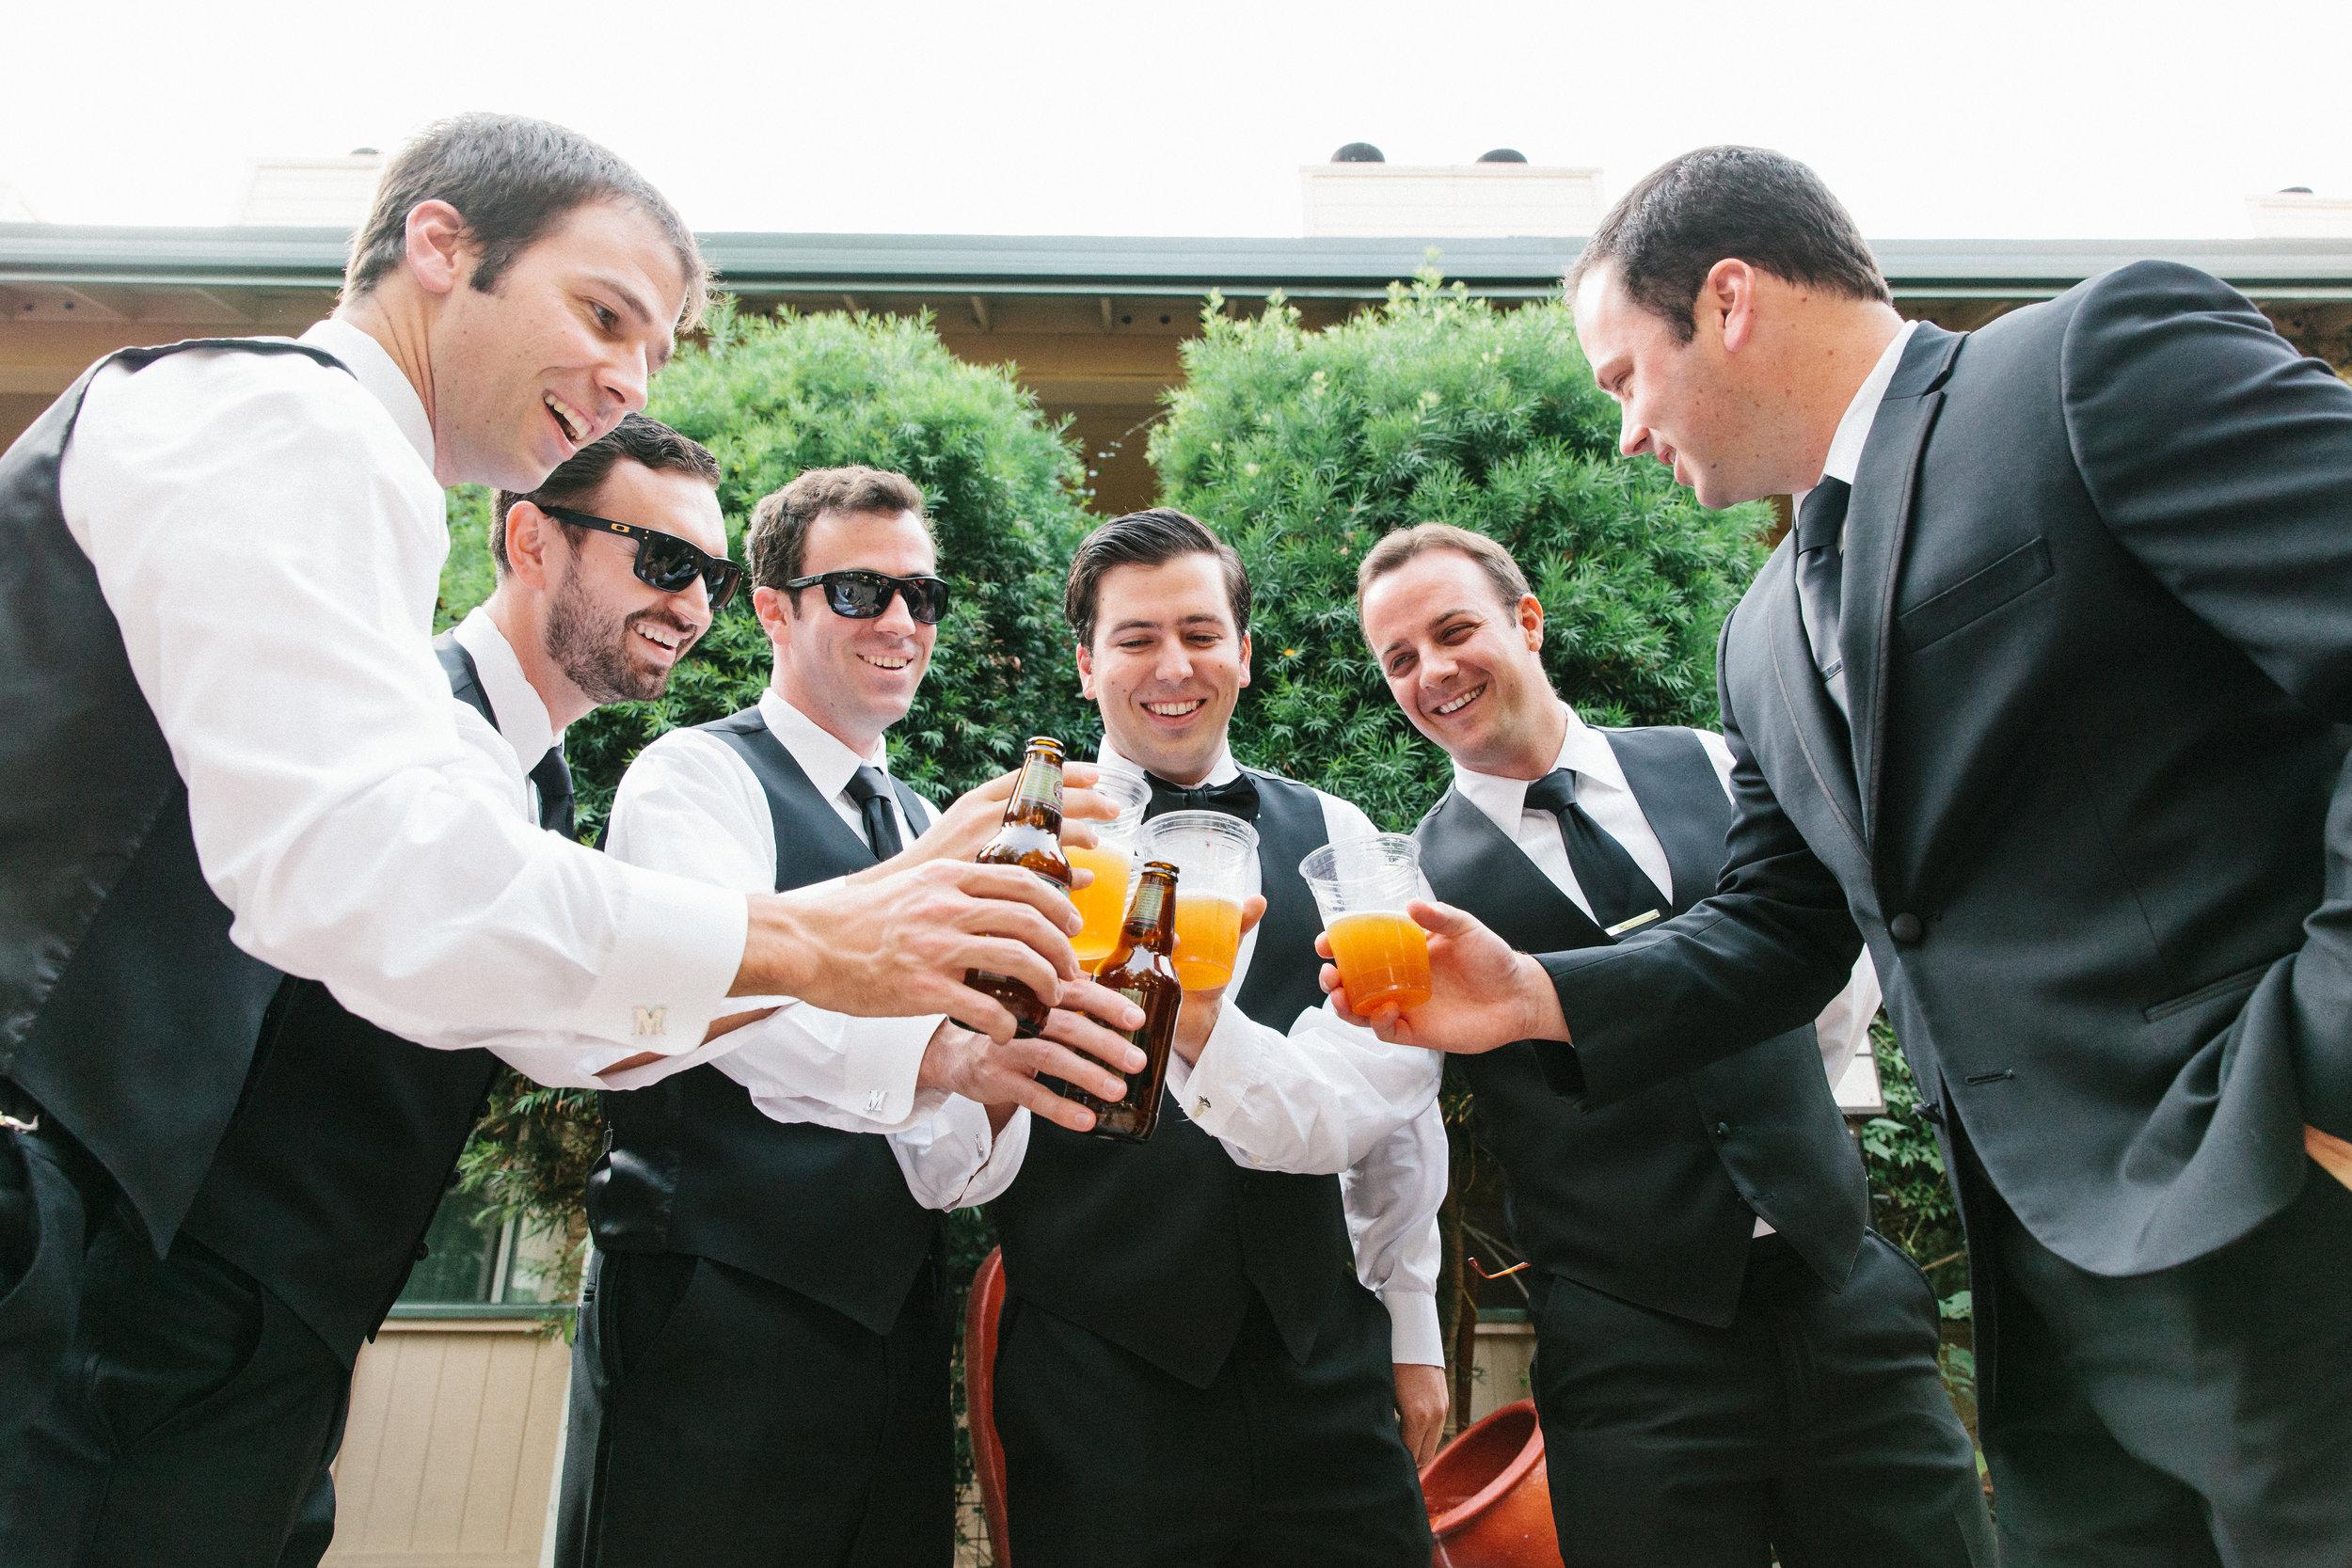 Ramekins Sonoma Wedding_DaidriSmythe-7.jpg